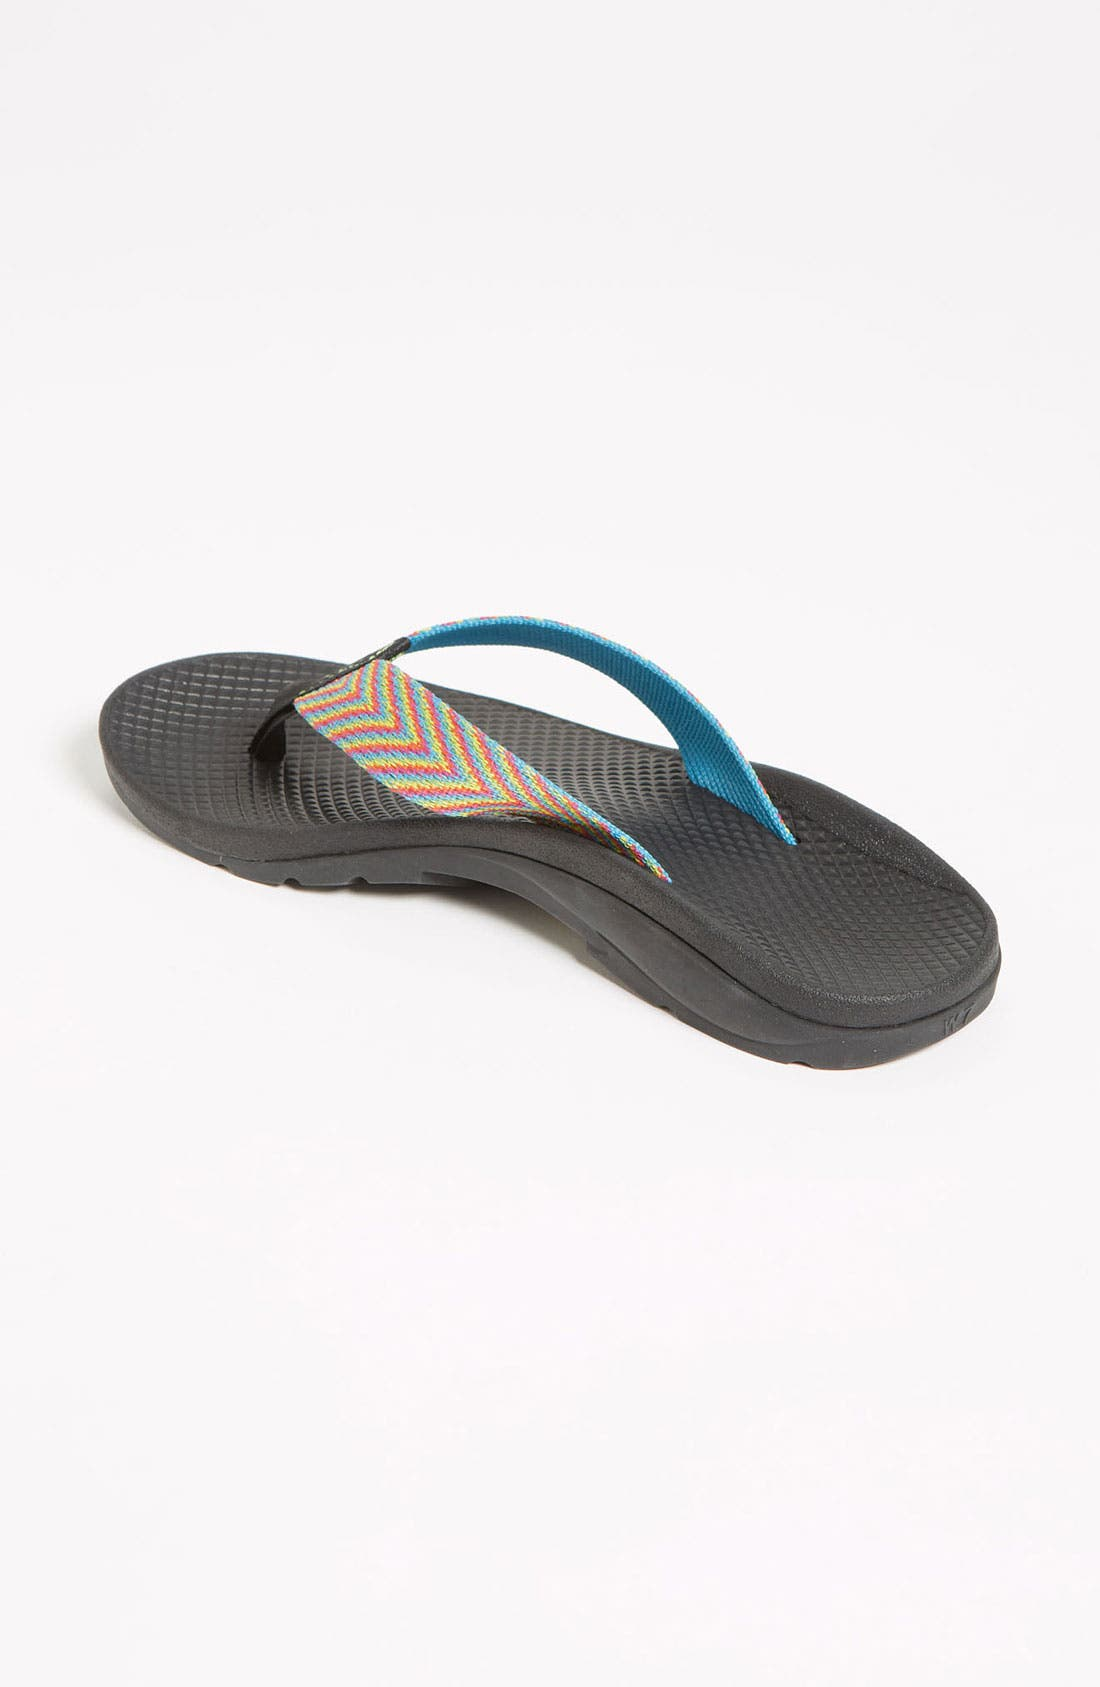 Alternate Image 2  - Chaco 'Flip Vibe' Sandal